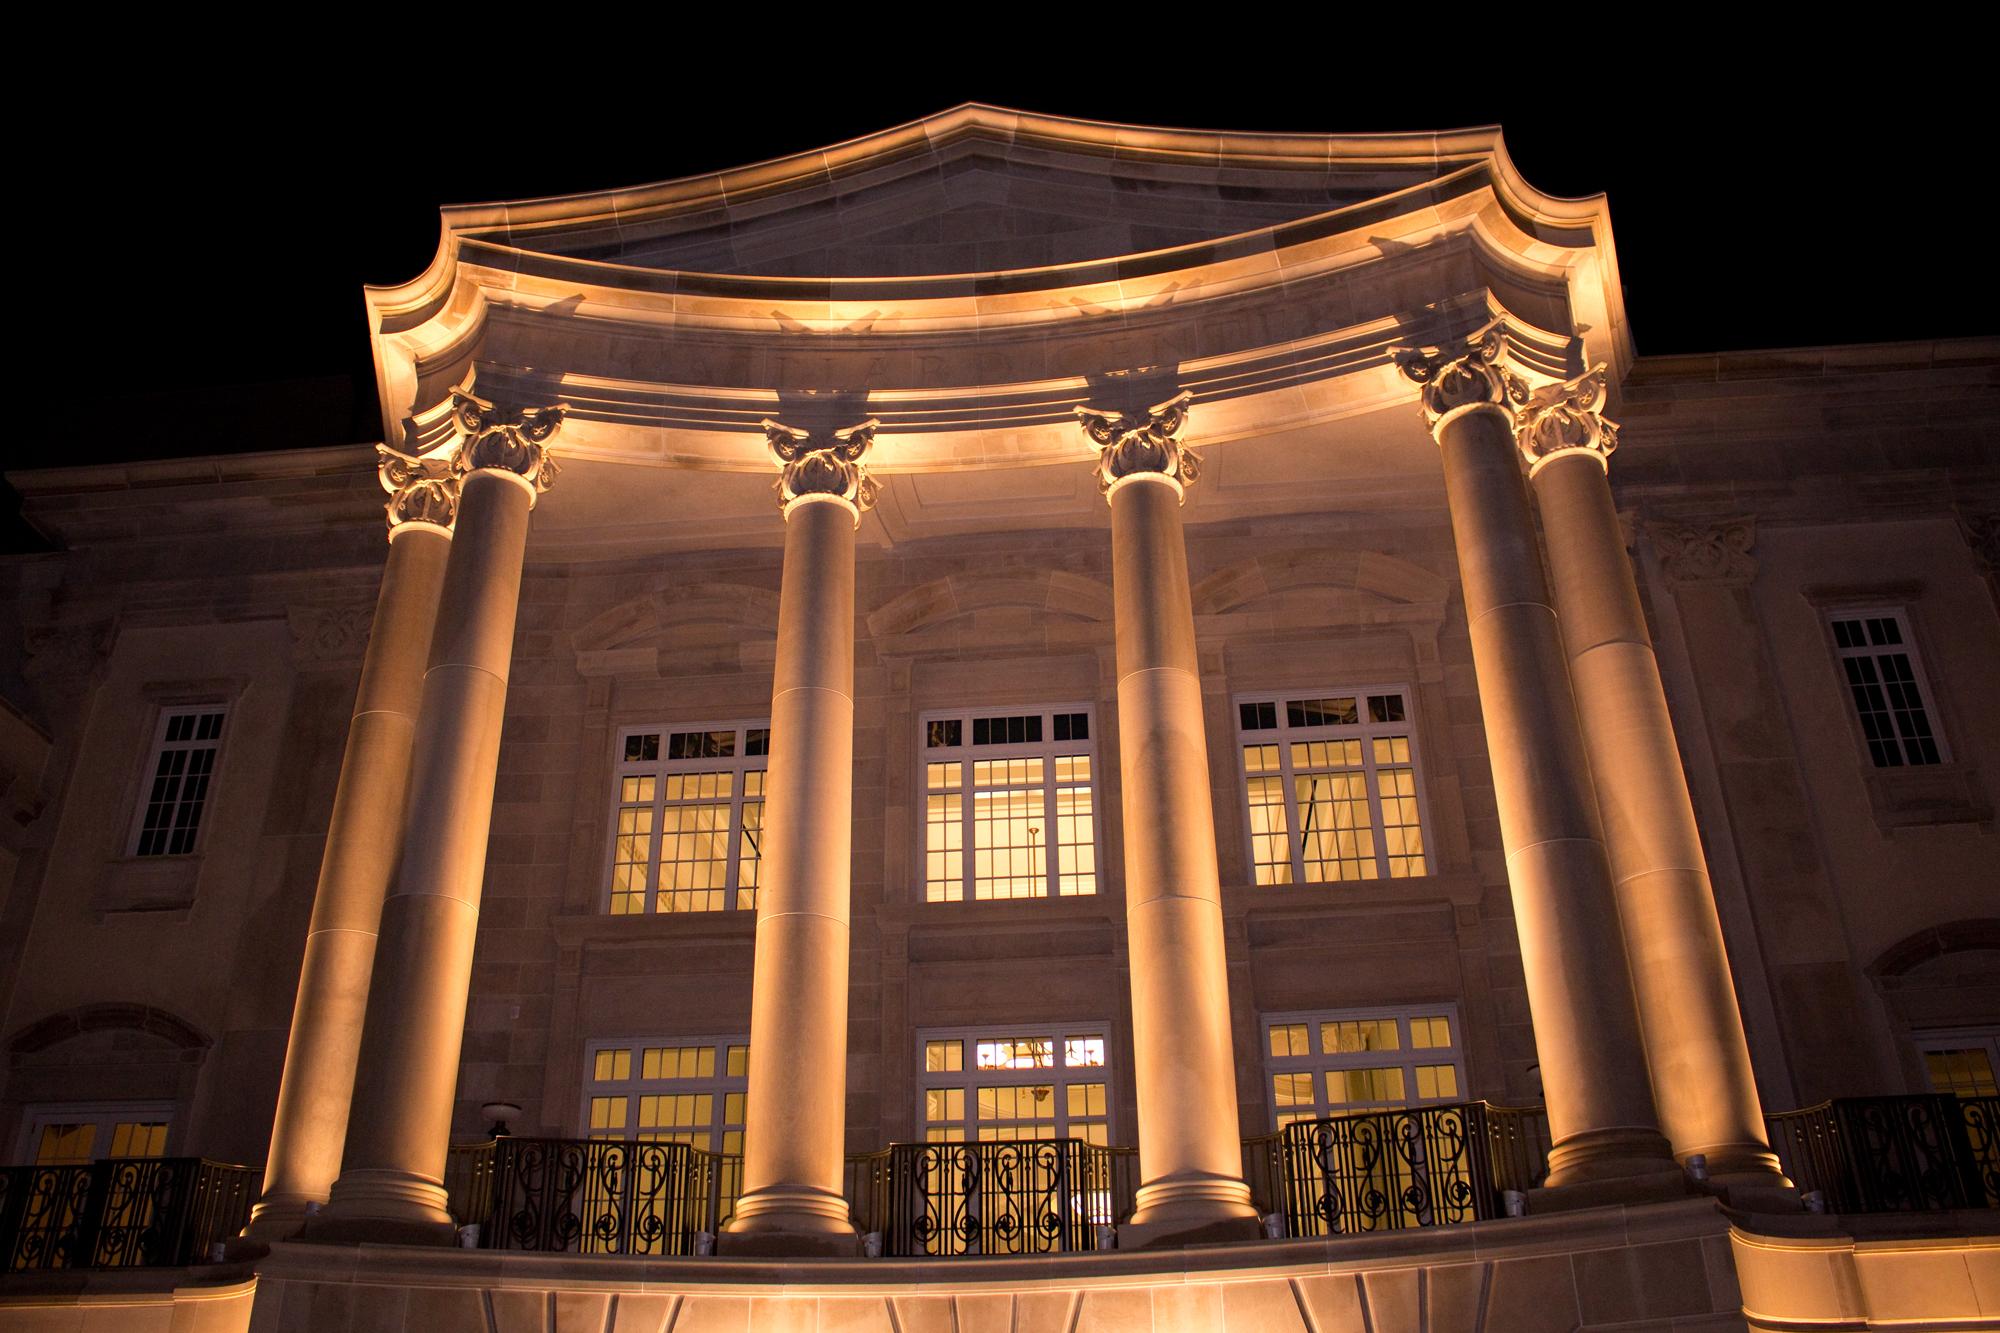 The Gaillard by night